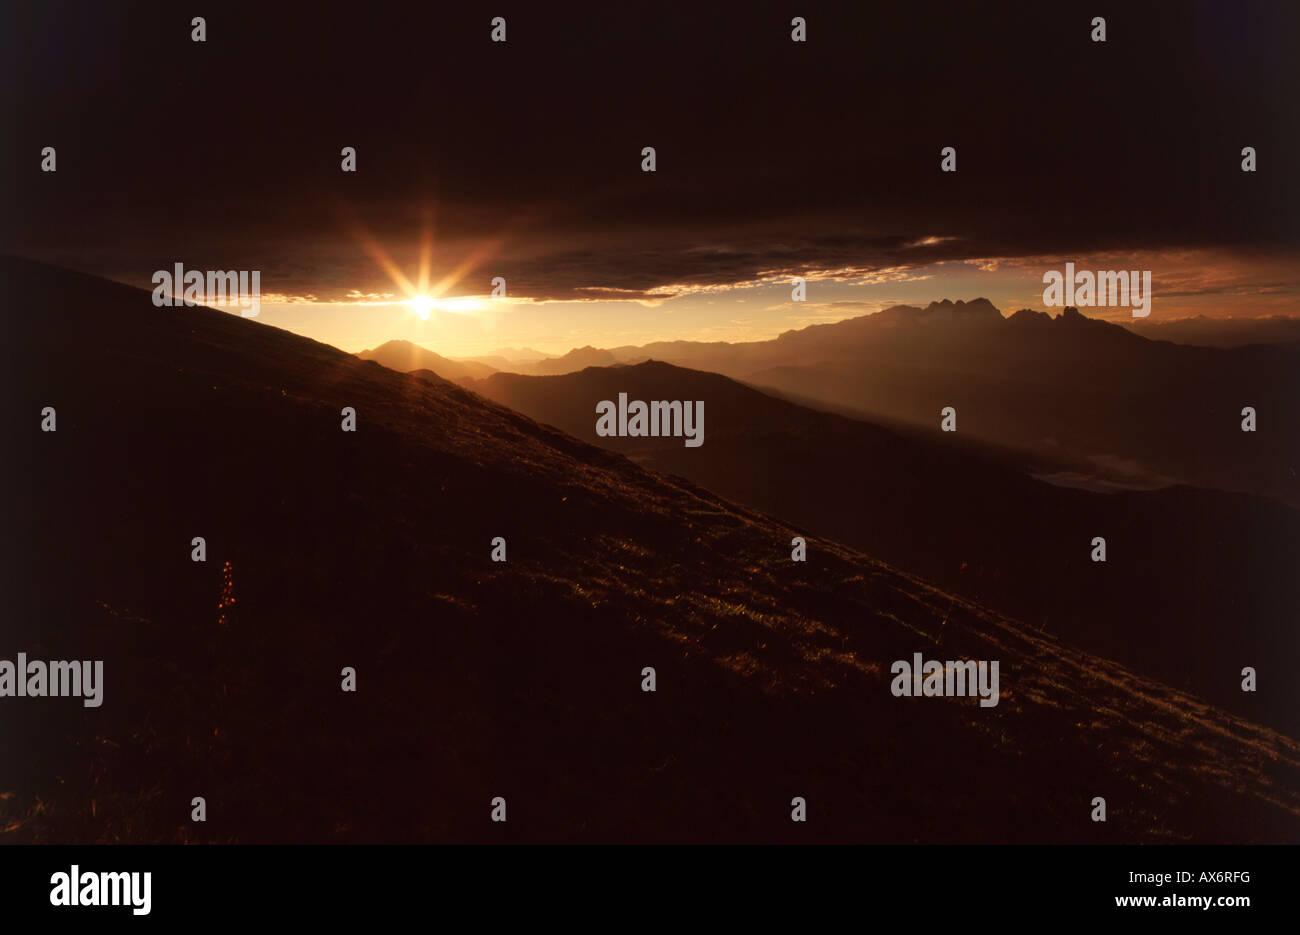 Sunrise over mountains, Osterhorngruppe, St. Koloman, Tennengau, Salzburg, Austria Stock Photo